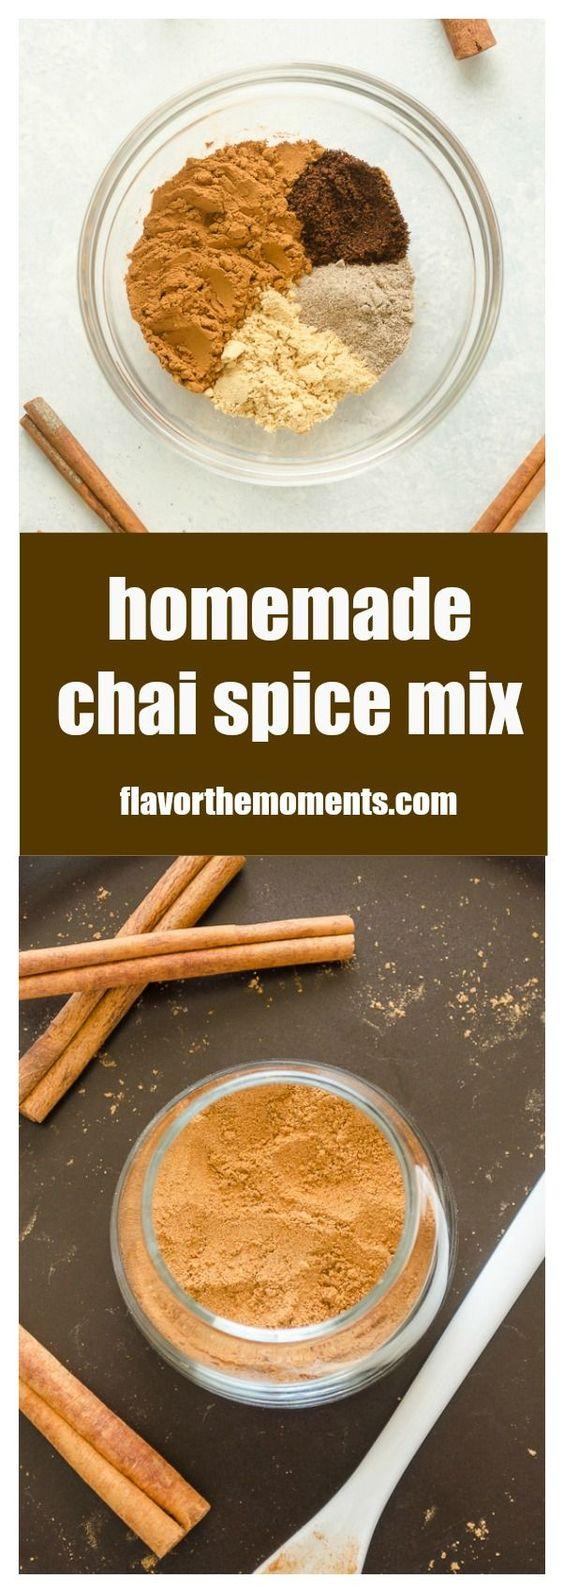 Homemade Chai Spice Mix | Recipe | Homemade, Warm and ...